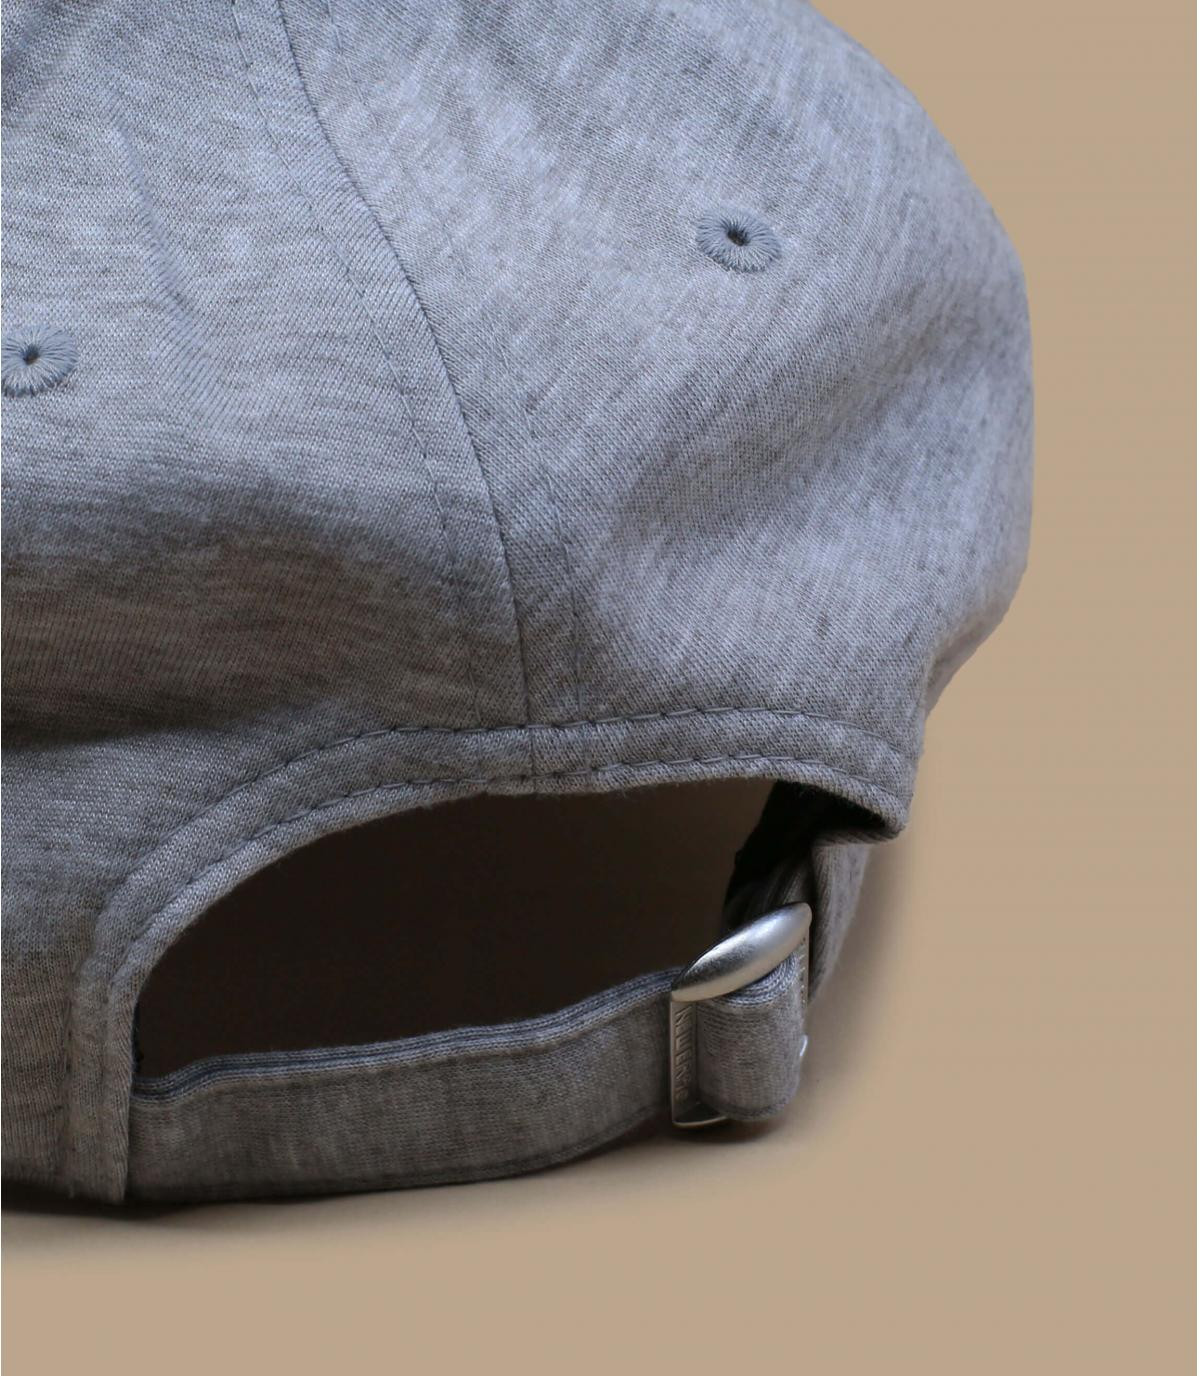 Détails Casquette Jersey Ess NY 940 grey neo mint - image 4